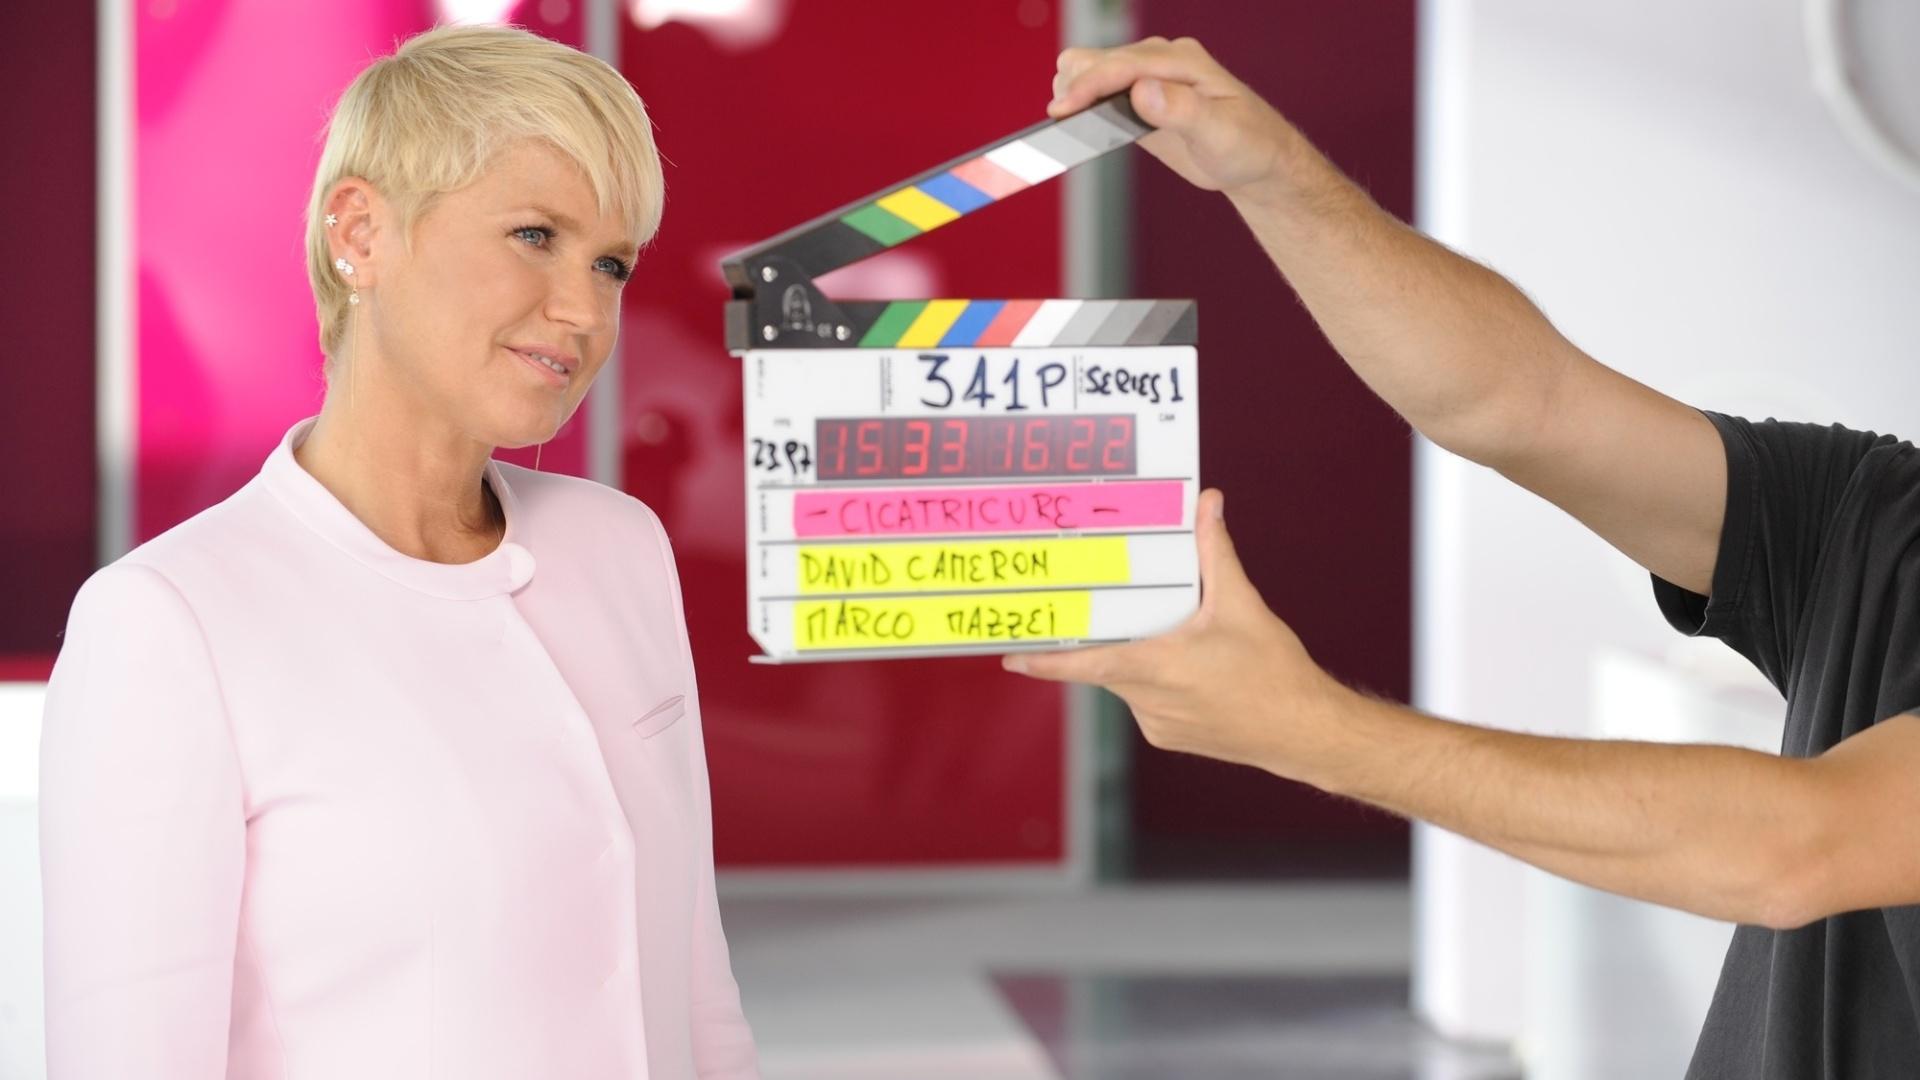 fev.2015 - Xuxa grava comercial de creme anti-idade na Argentina, dirigido pelo cineasta David Cameron